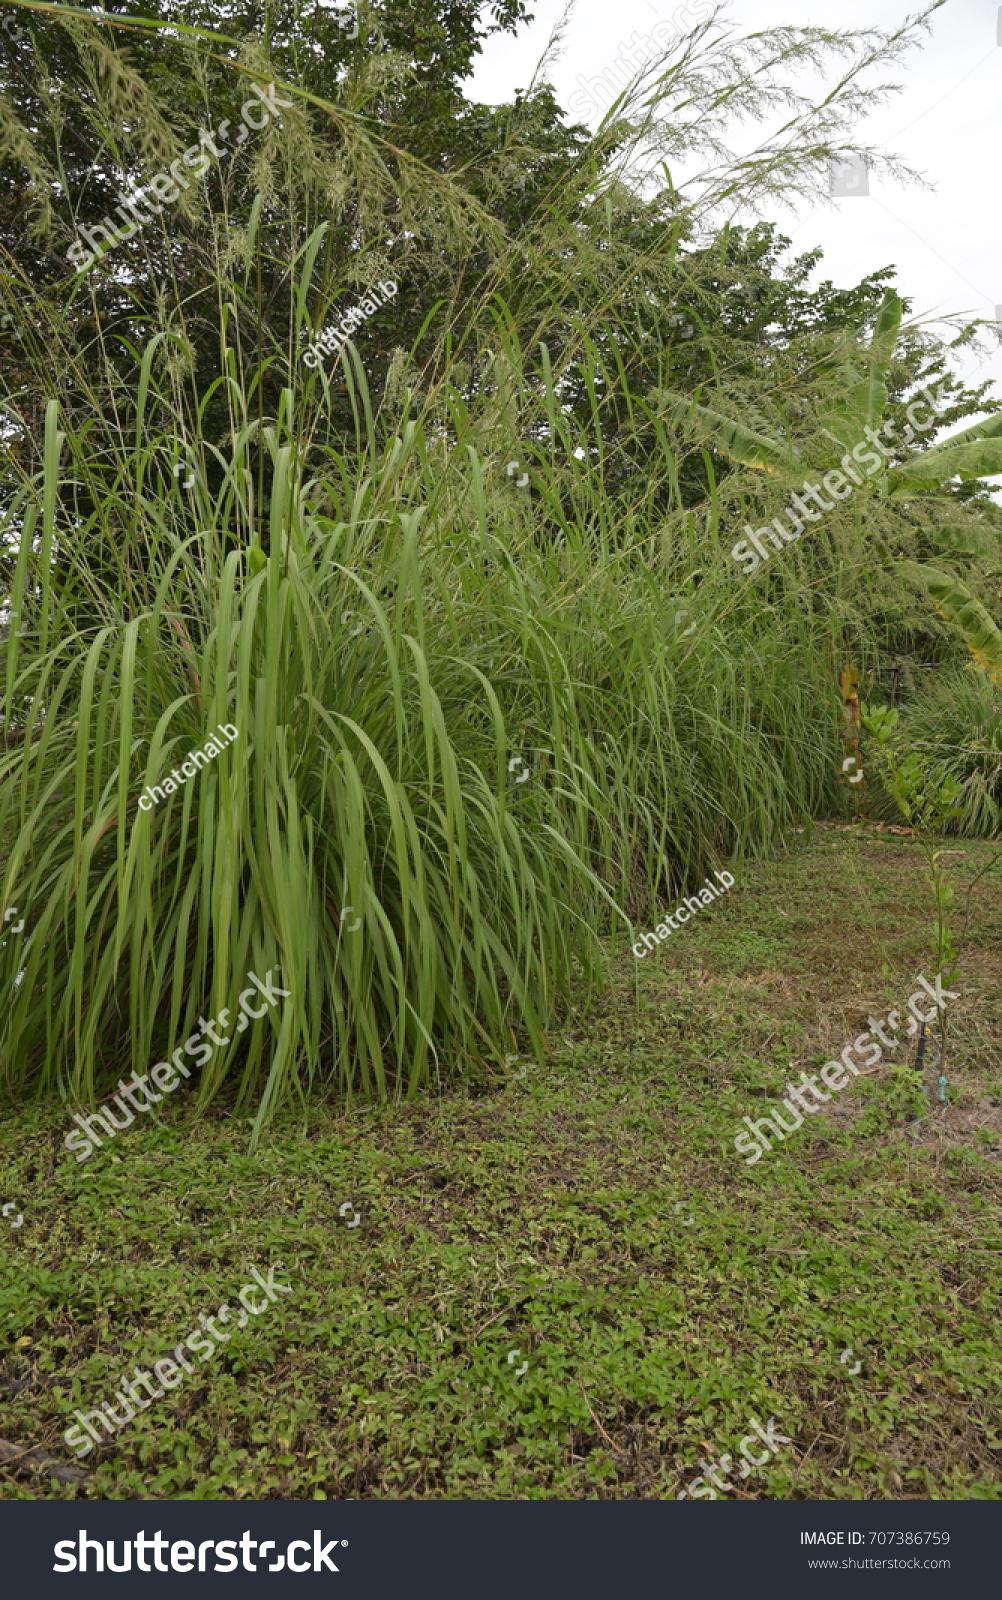 Citronella Grasssarah Grasscymbopogon Nardus Rendle Stock Photo